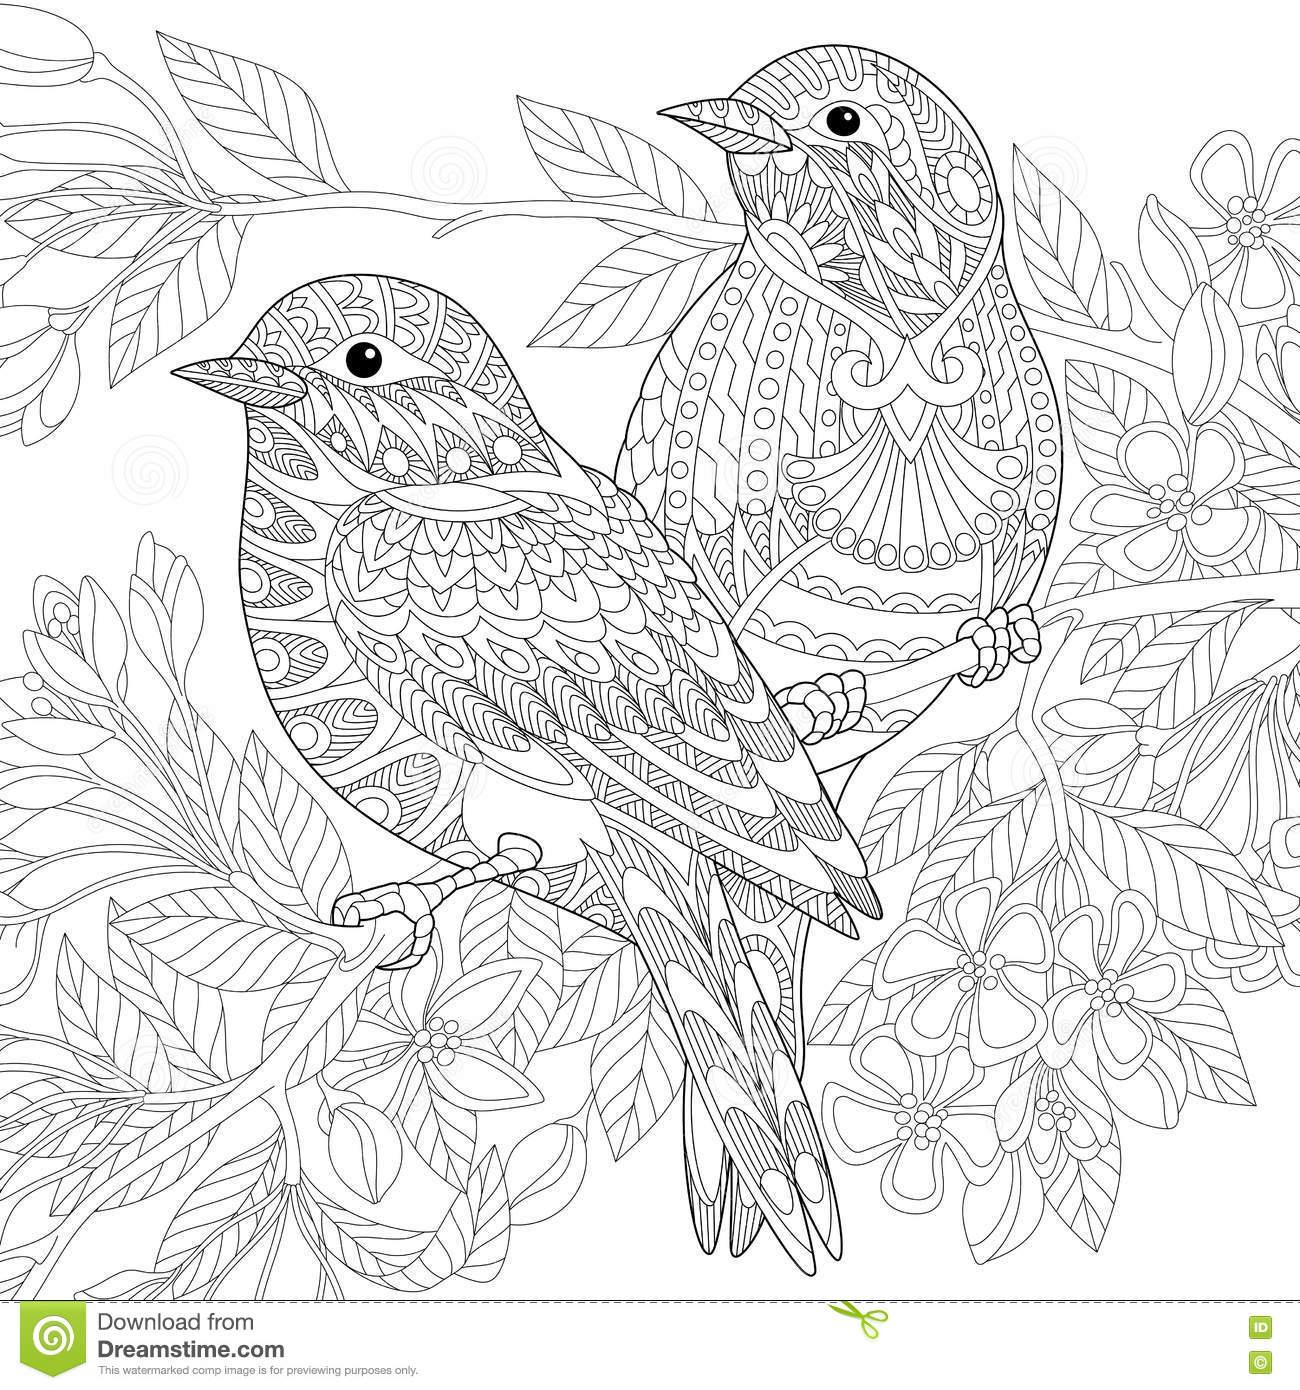 coloring book for adults souq دفاتر تلوين للكبار فكرة مجنونة باعت مليون نسخة adults souq coloring for book